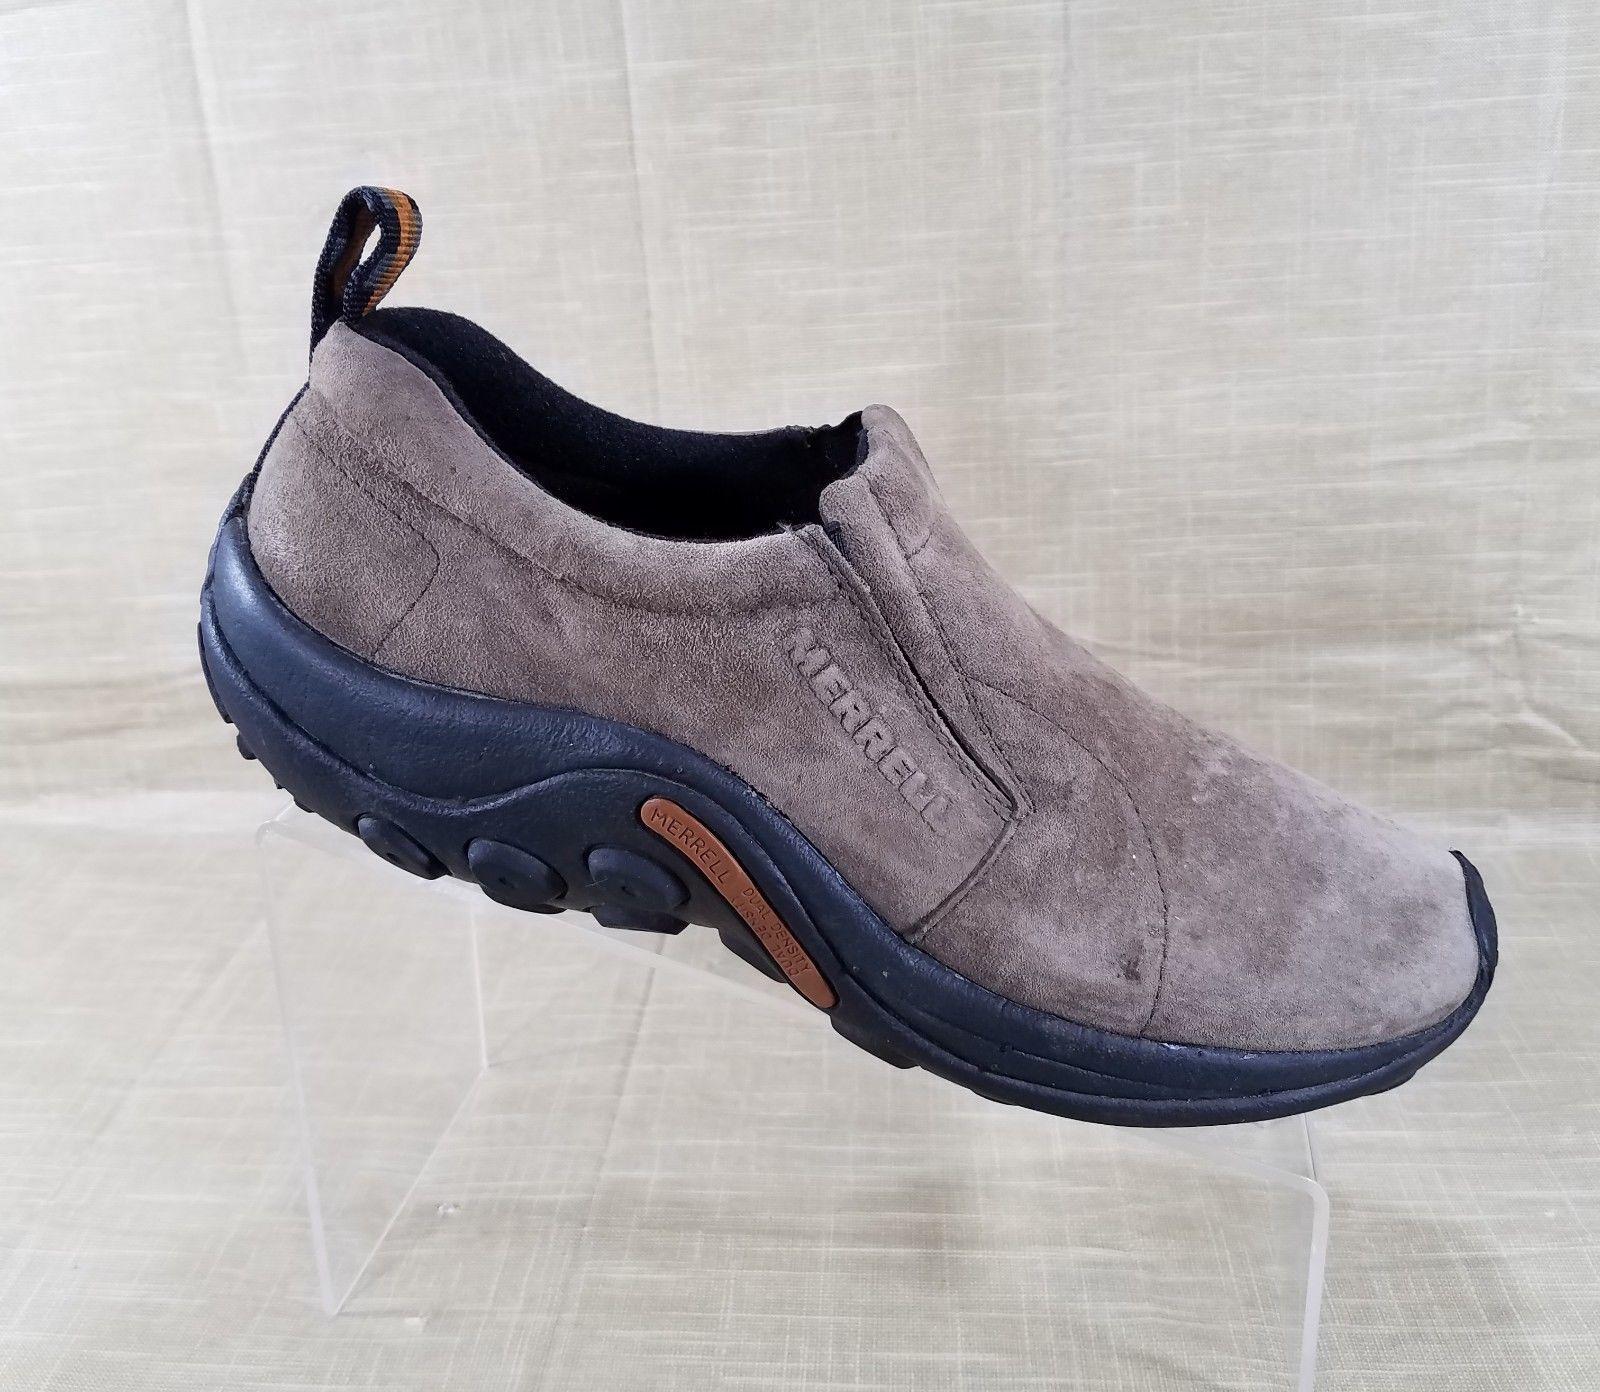 Merrell Jungle Moc Casual Slip On Shoes Womens Size 10 Gunsmoke Brown J60788